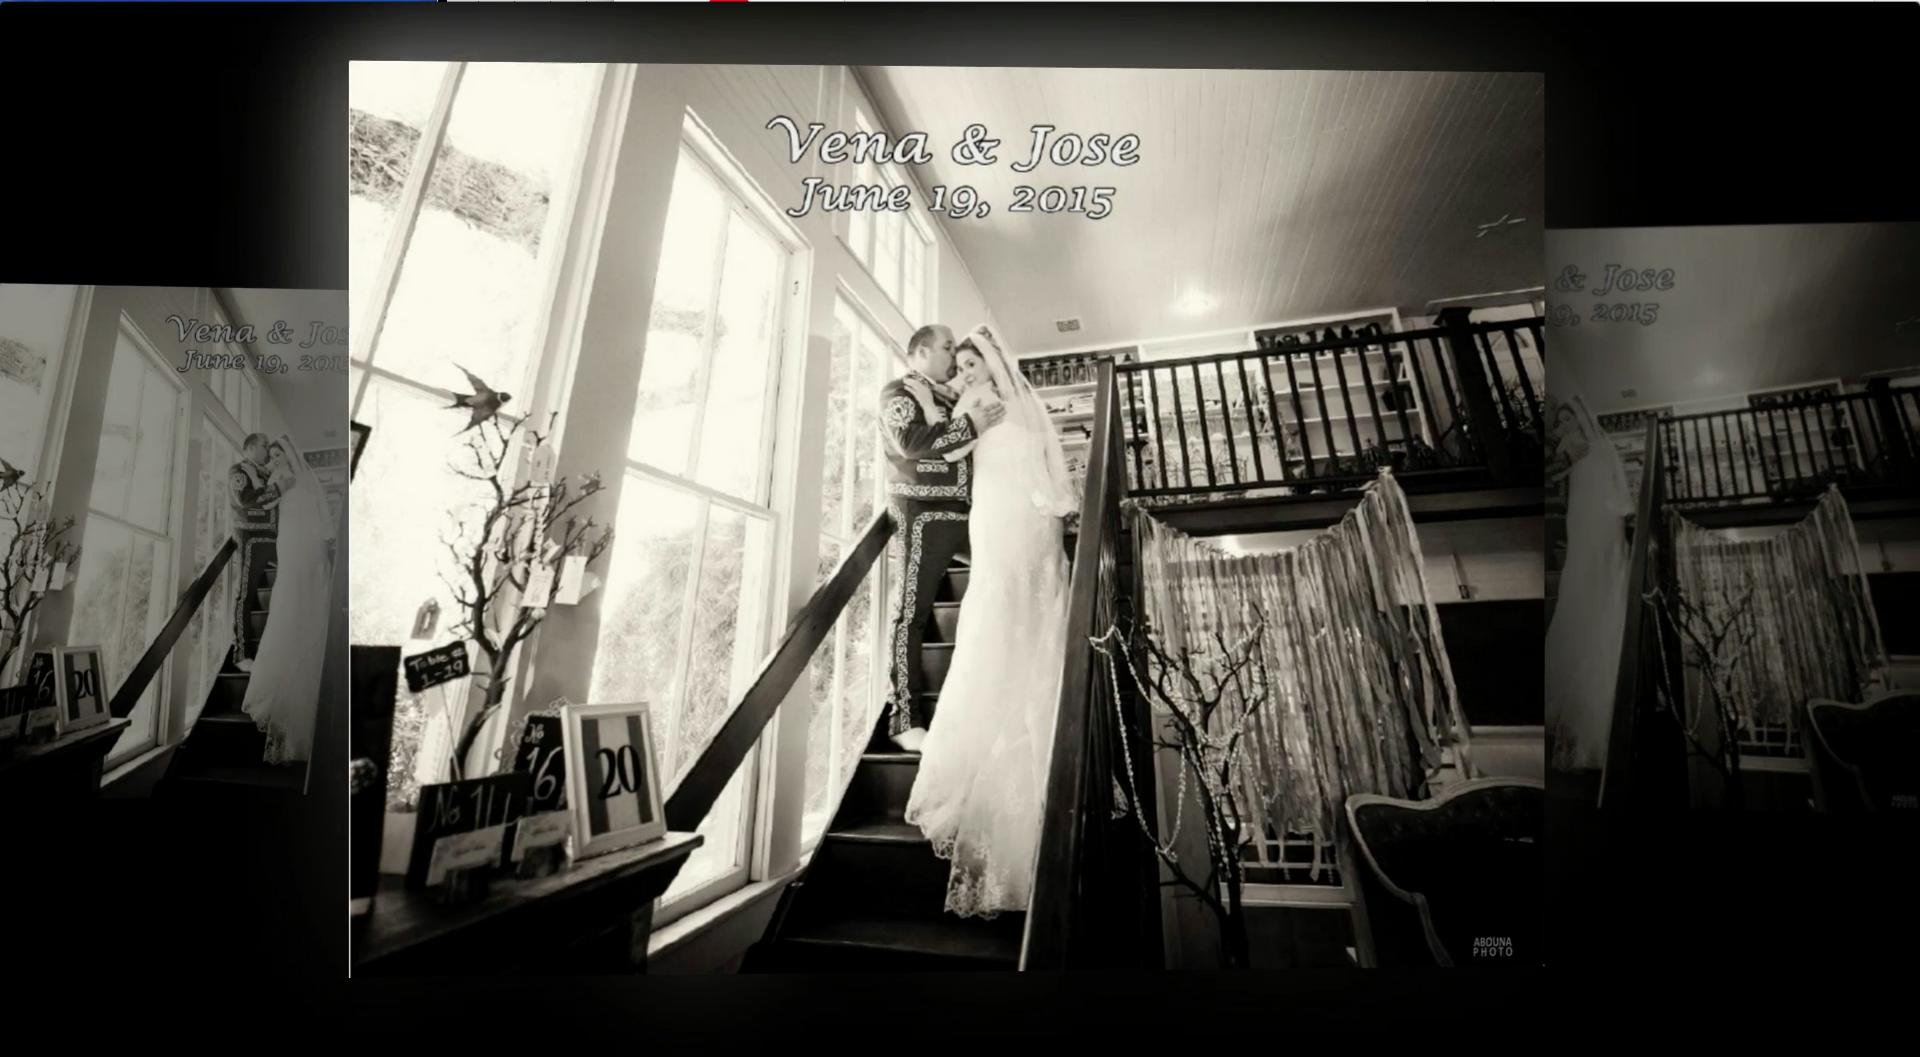 Wedding Photography Printing: Wedding Album Design And Printing For Vena And Jose